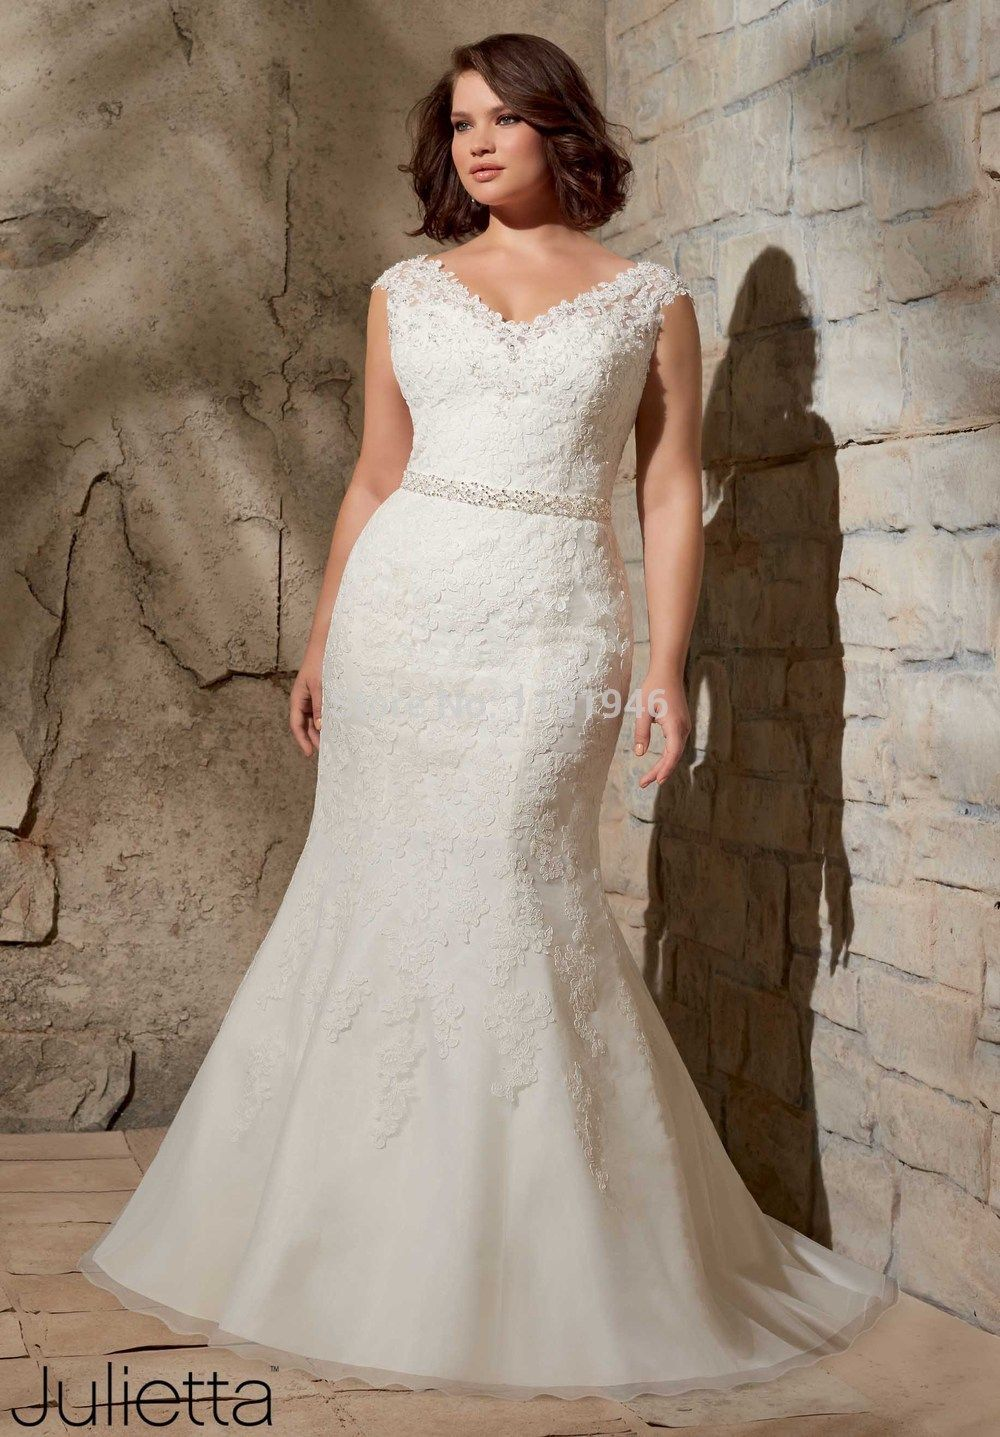 Pin by Jennifer muir on wedding dresses | Plus size wedding ...